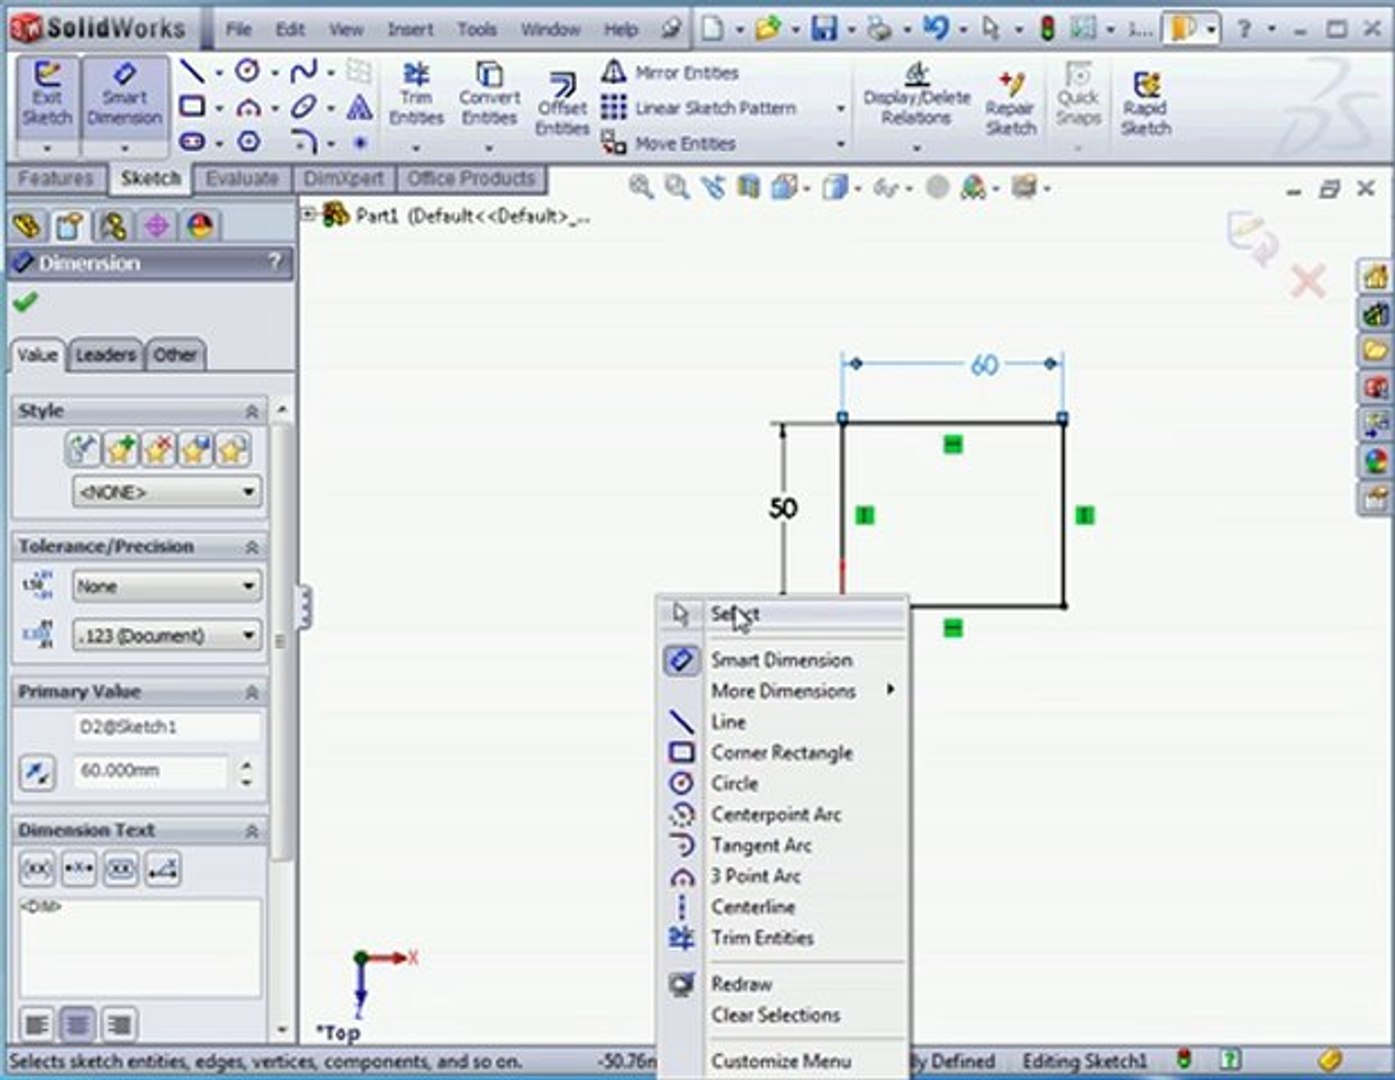 solidworks 2011 tutorials: Dimensions